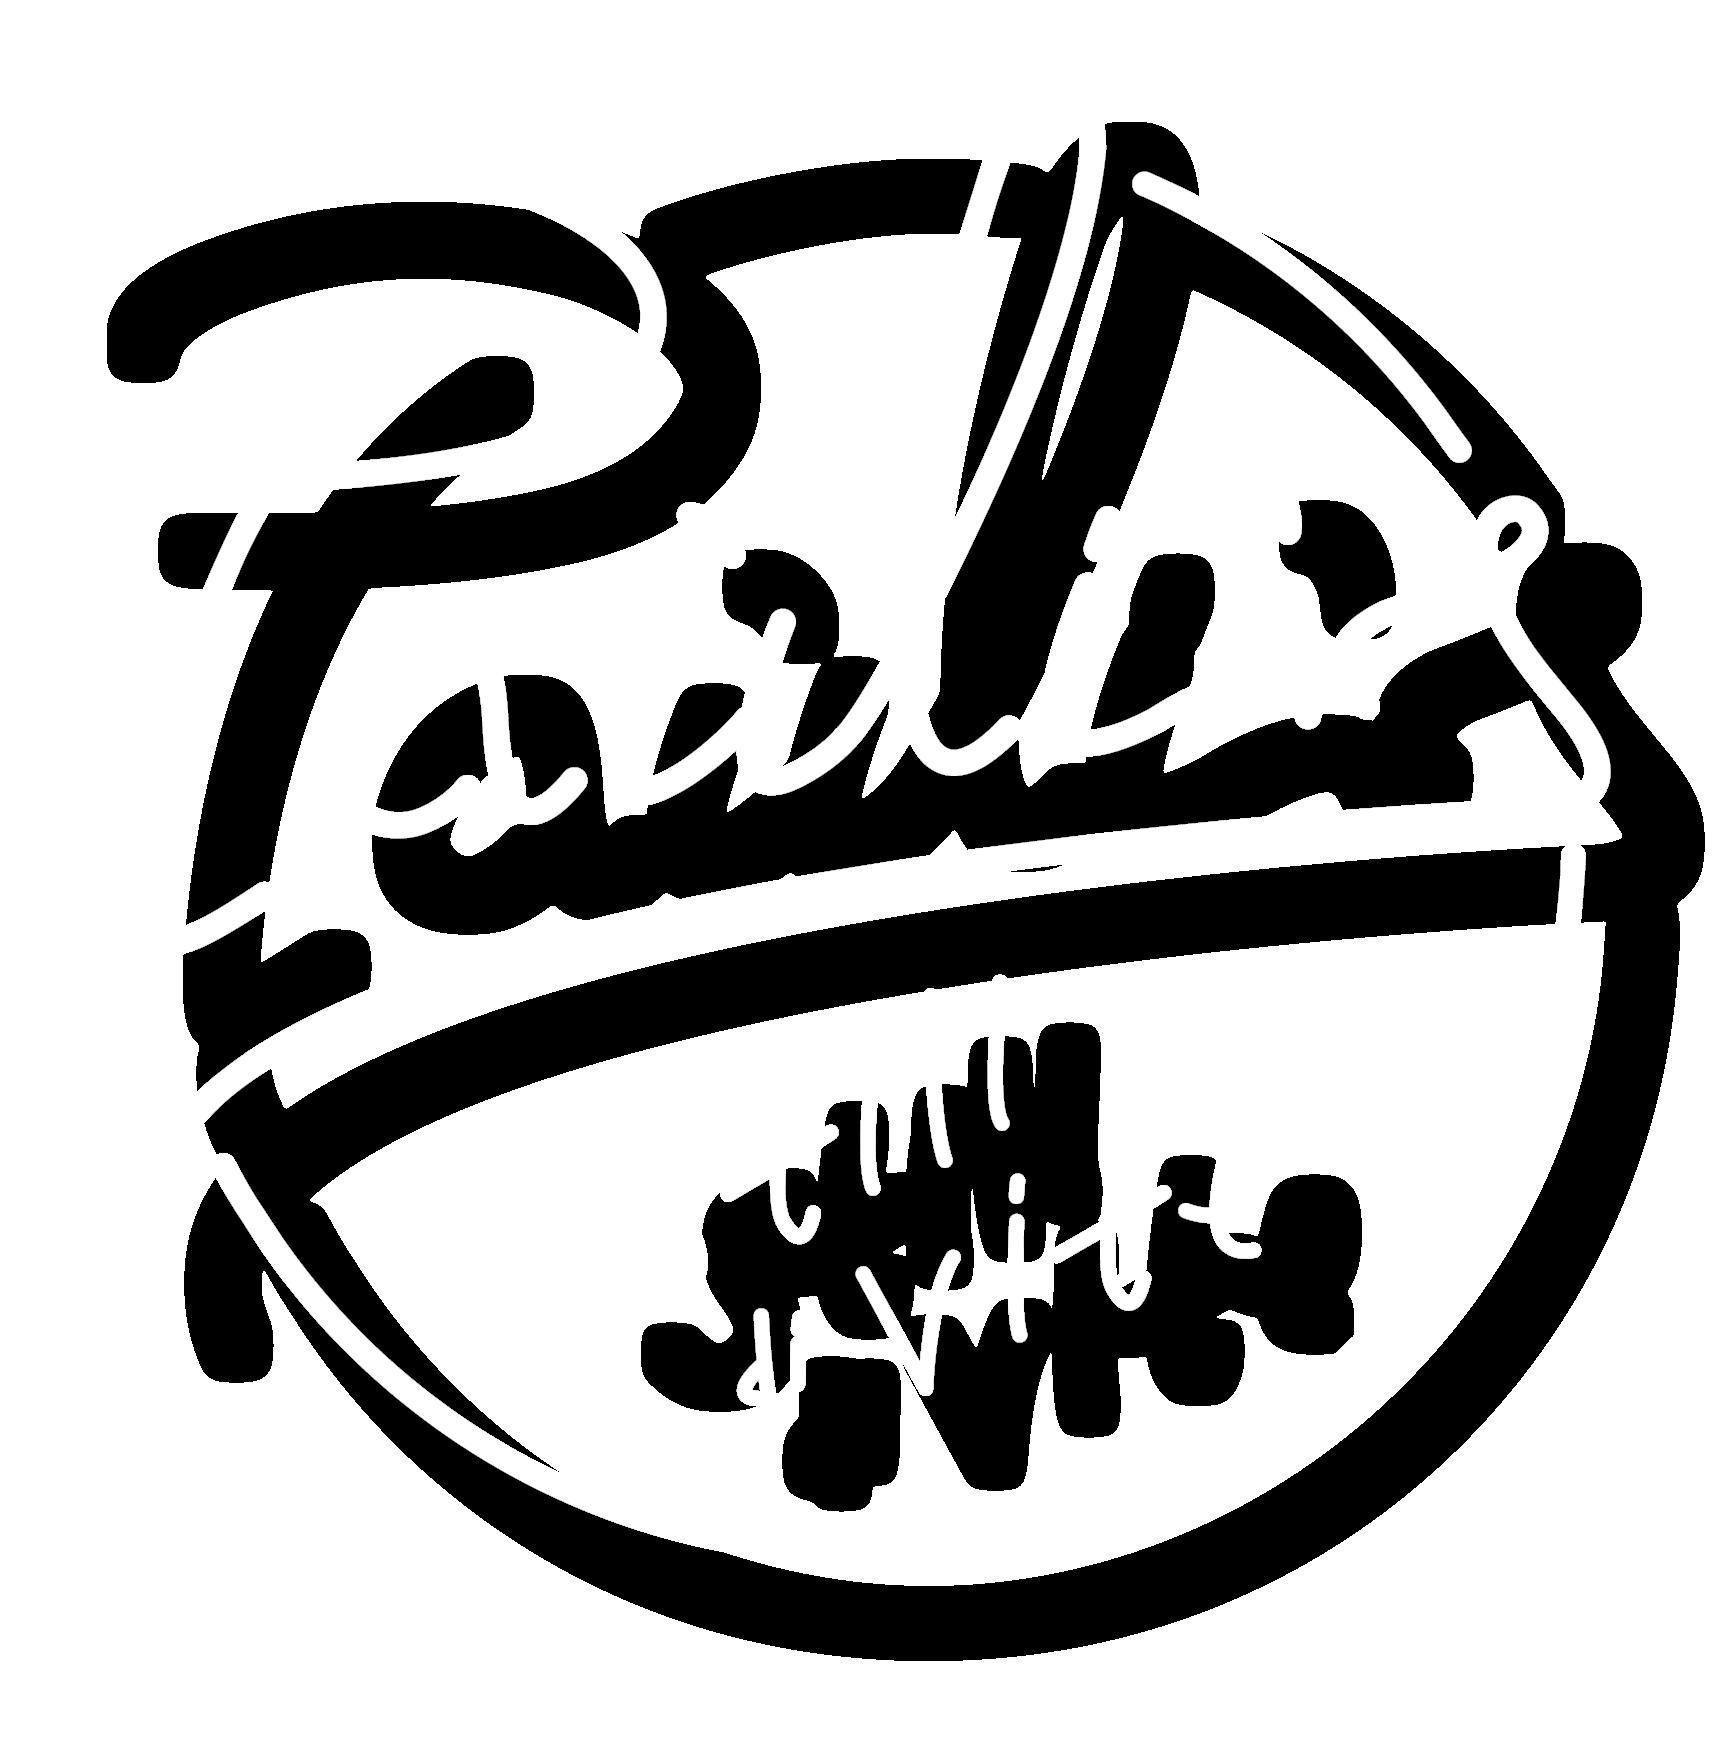 Marchio Pauli's - stili di vite